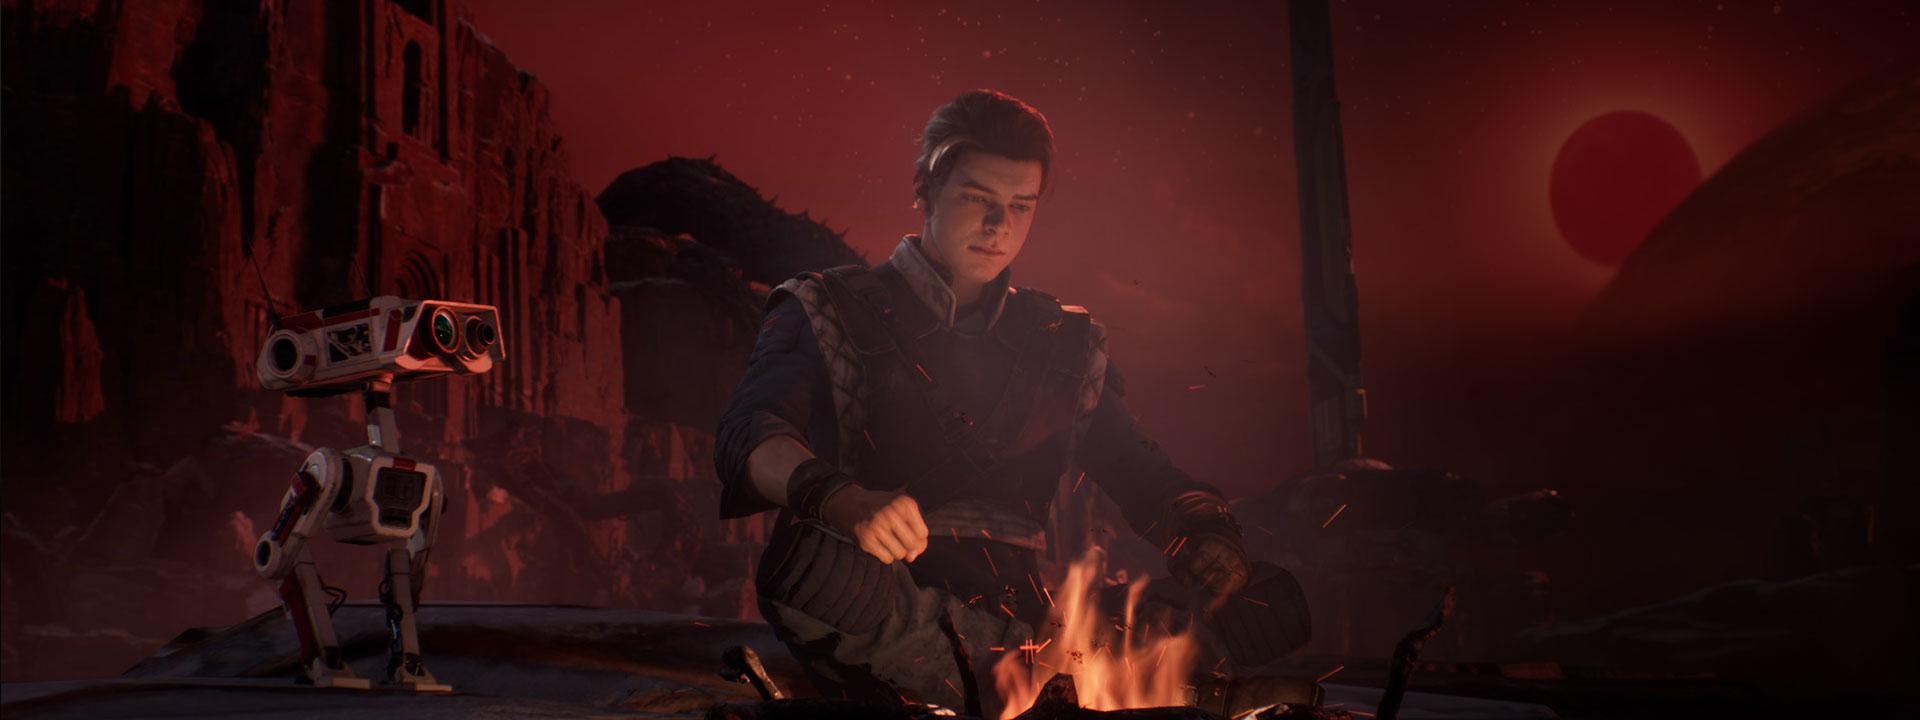 Cal Kestis sedí před ohněm vedle malého droida